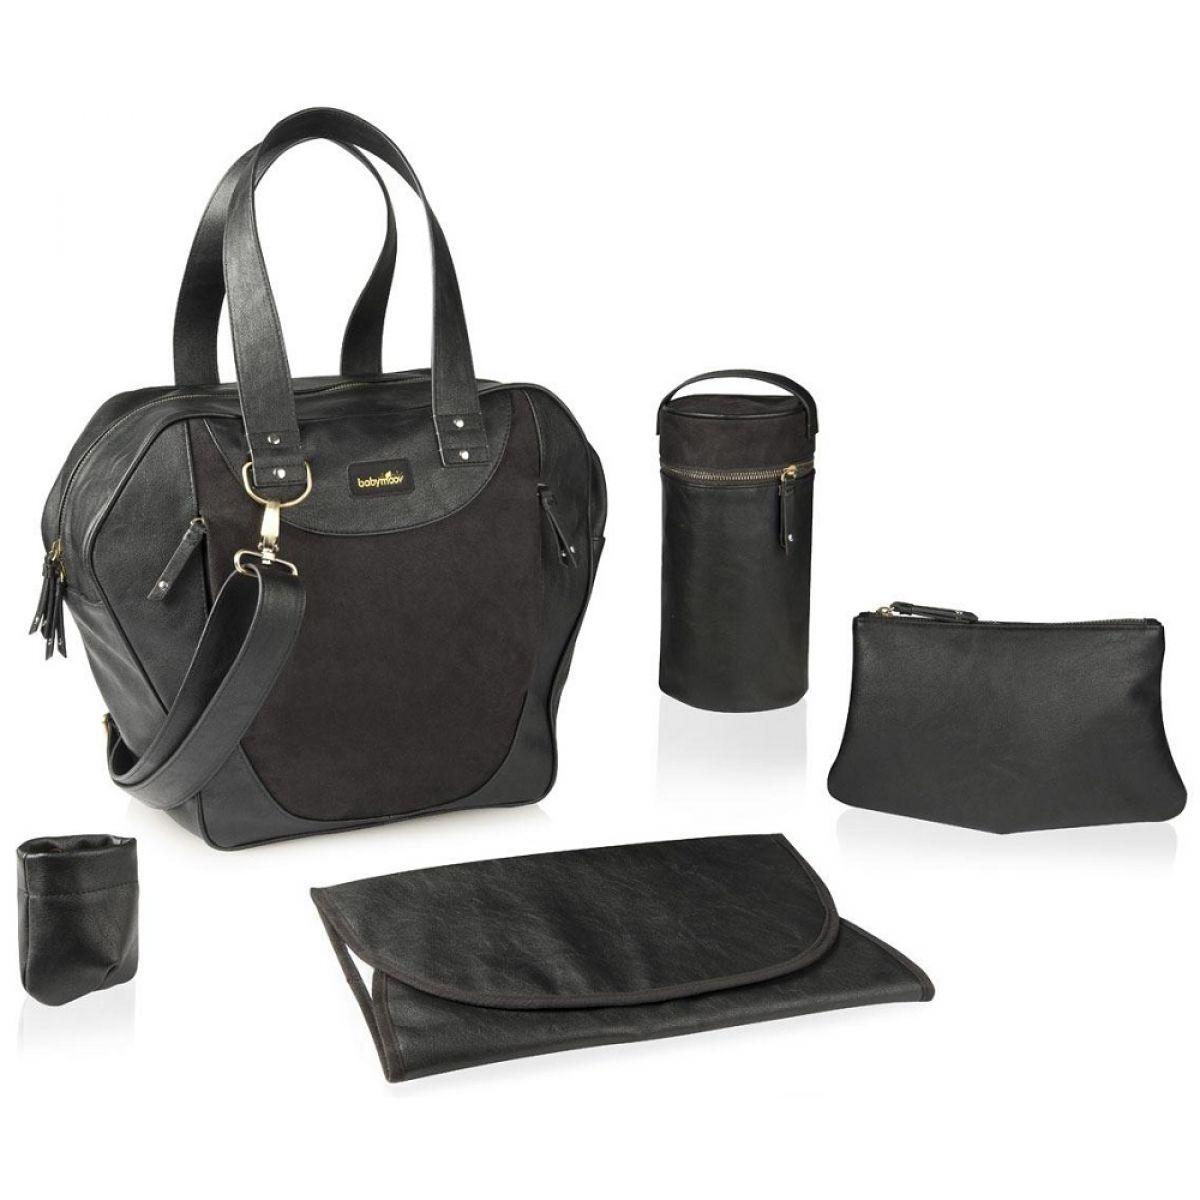 Babymoov City Bag Black